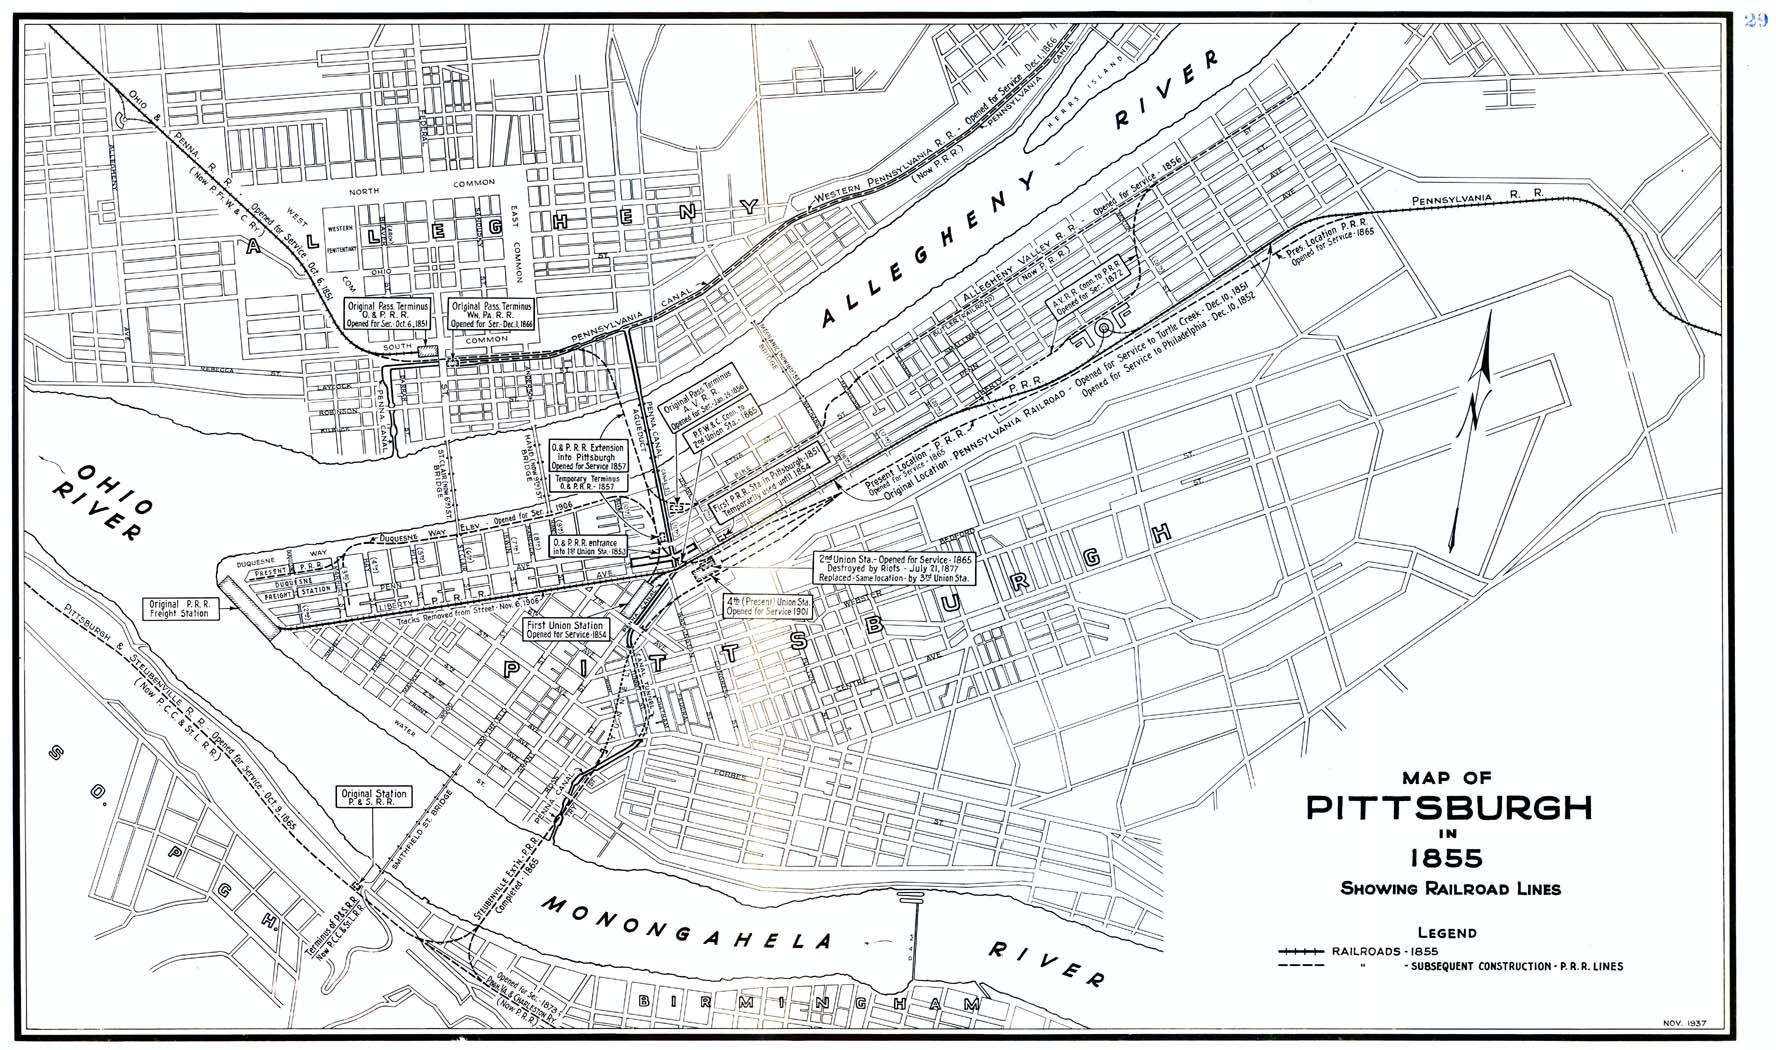 Pittsburg Area Prr Maps